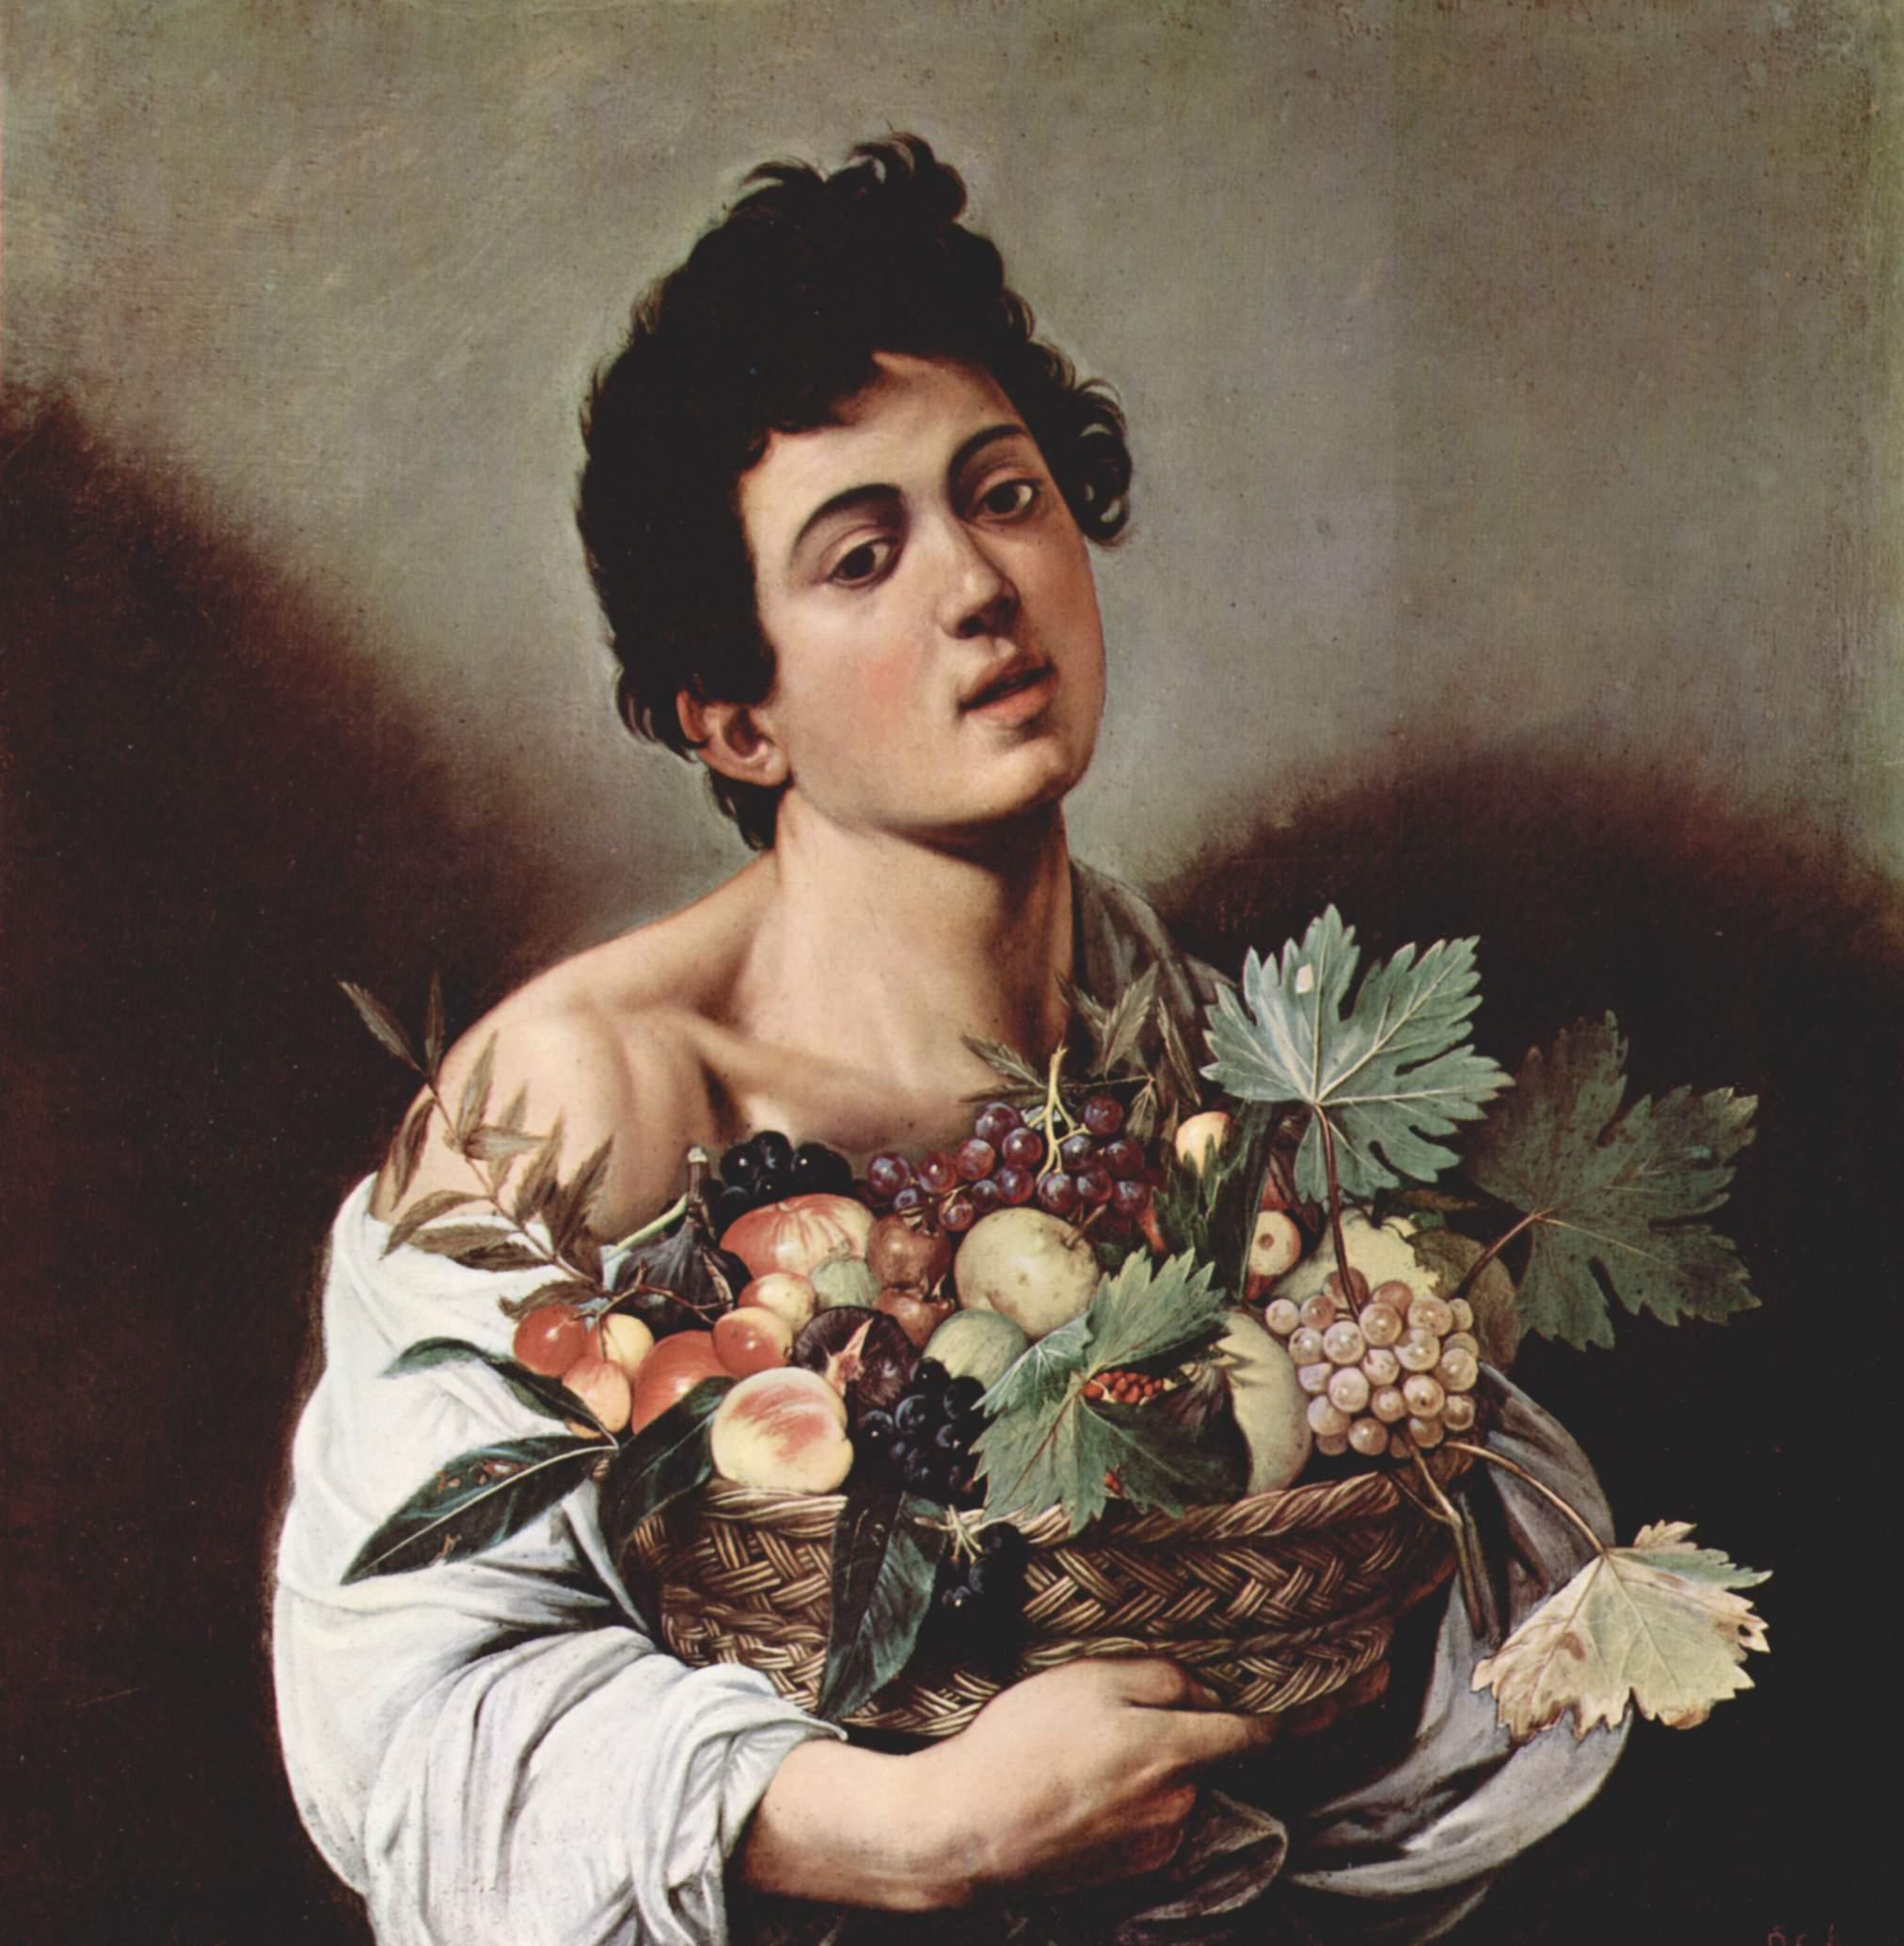 boy-with-a-basket-of-fruit(1).jpg